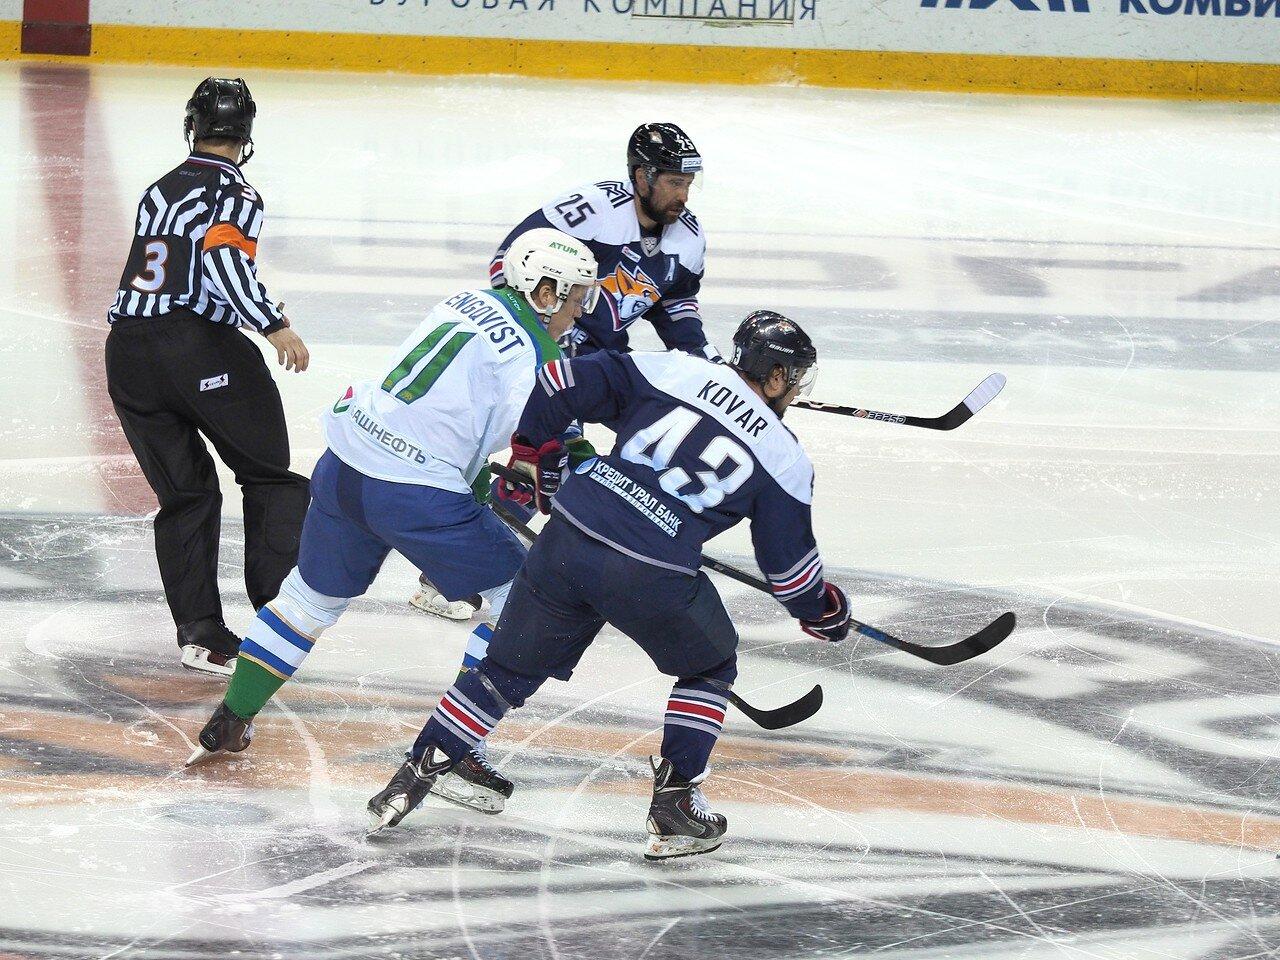 63Плей-офф 2016 Восток Финал Металлург - Салават Юлаев 23.03.2016